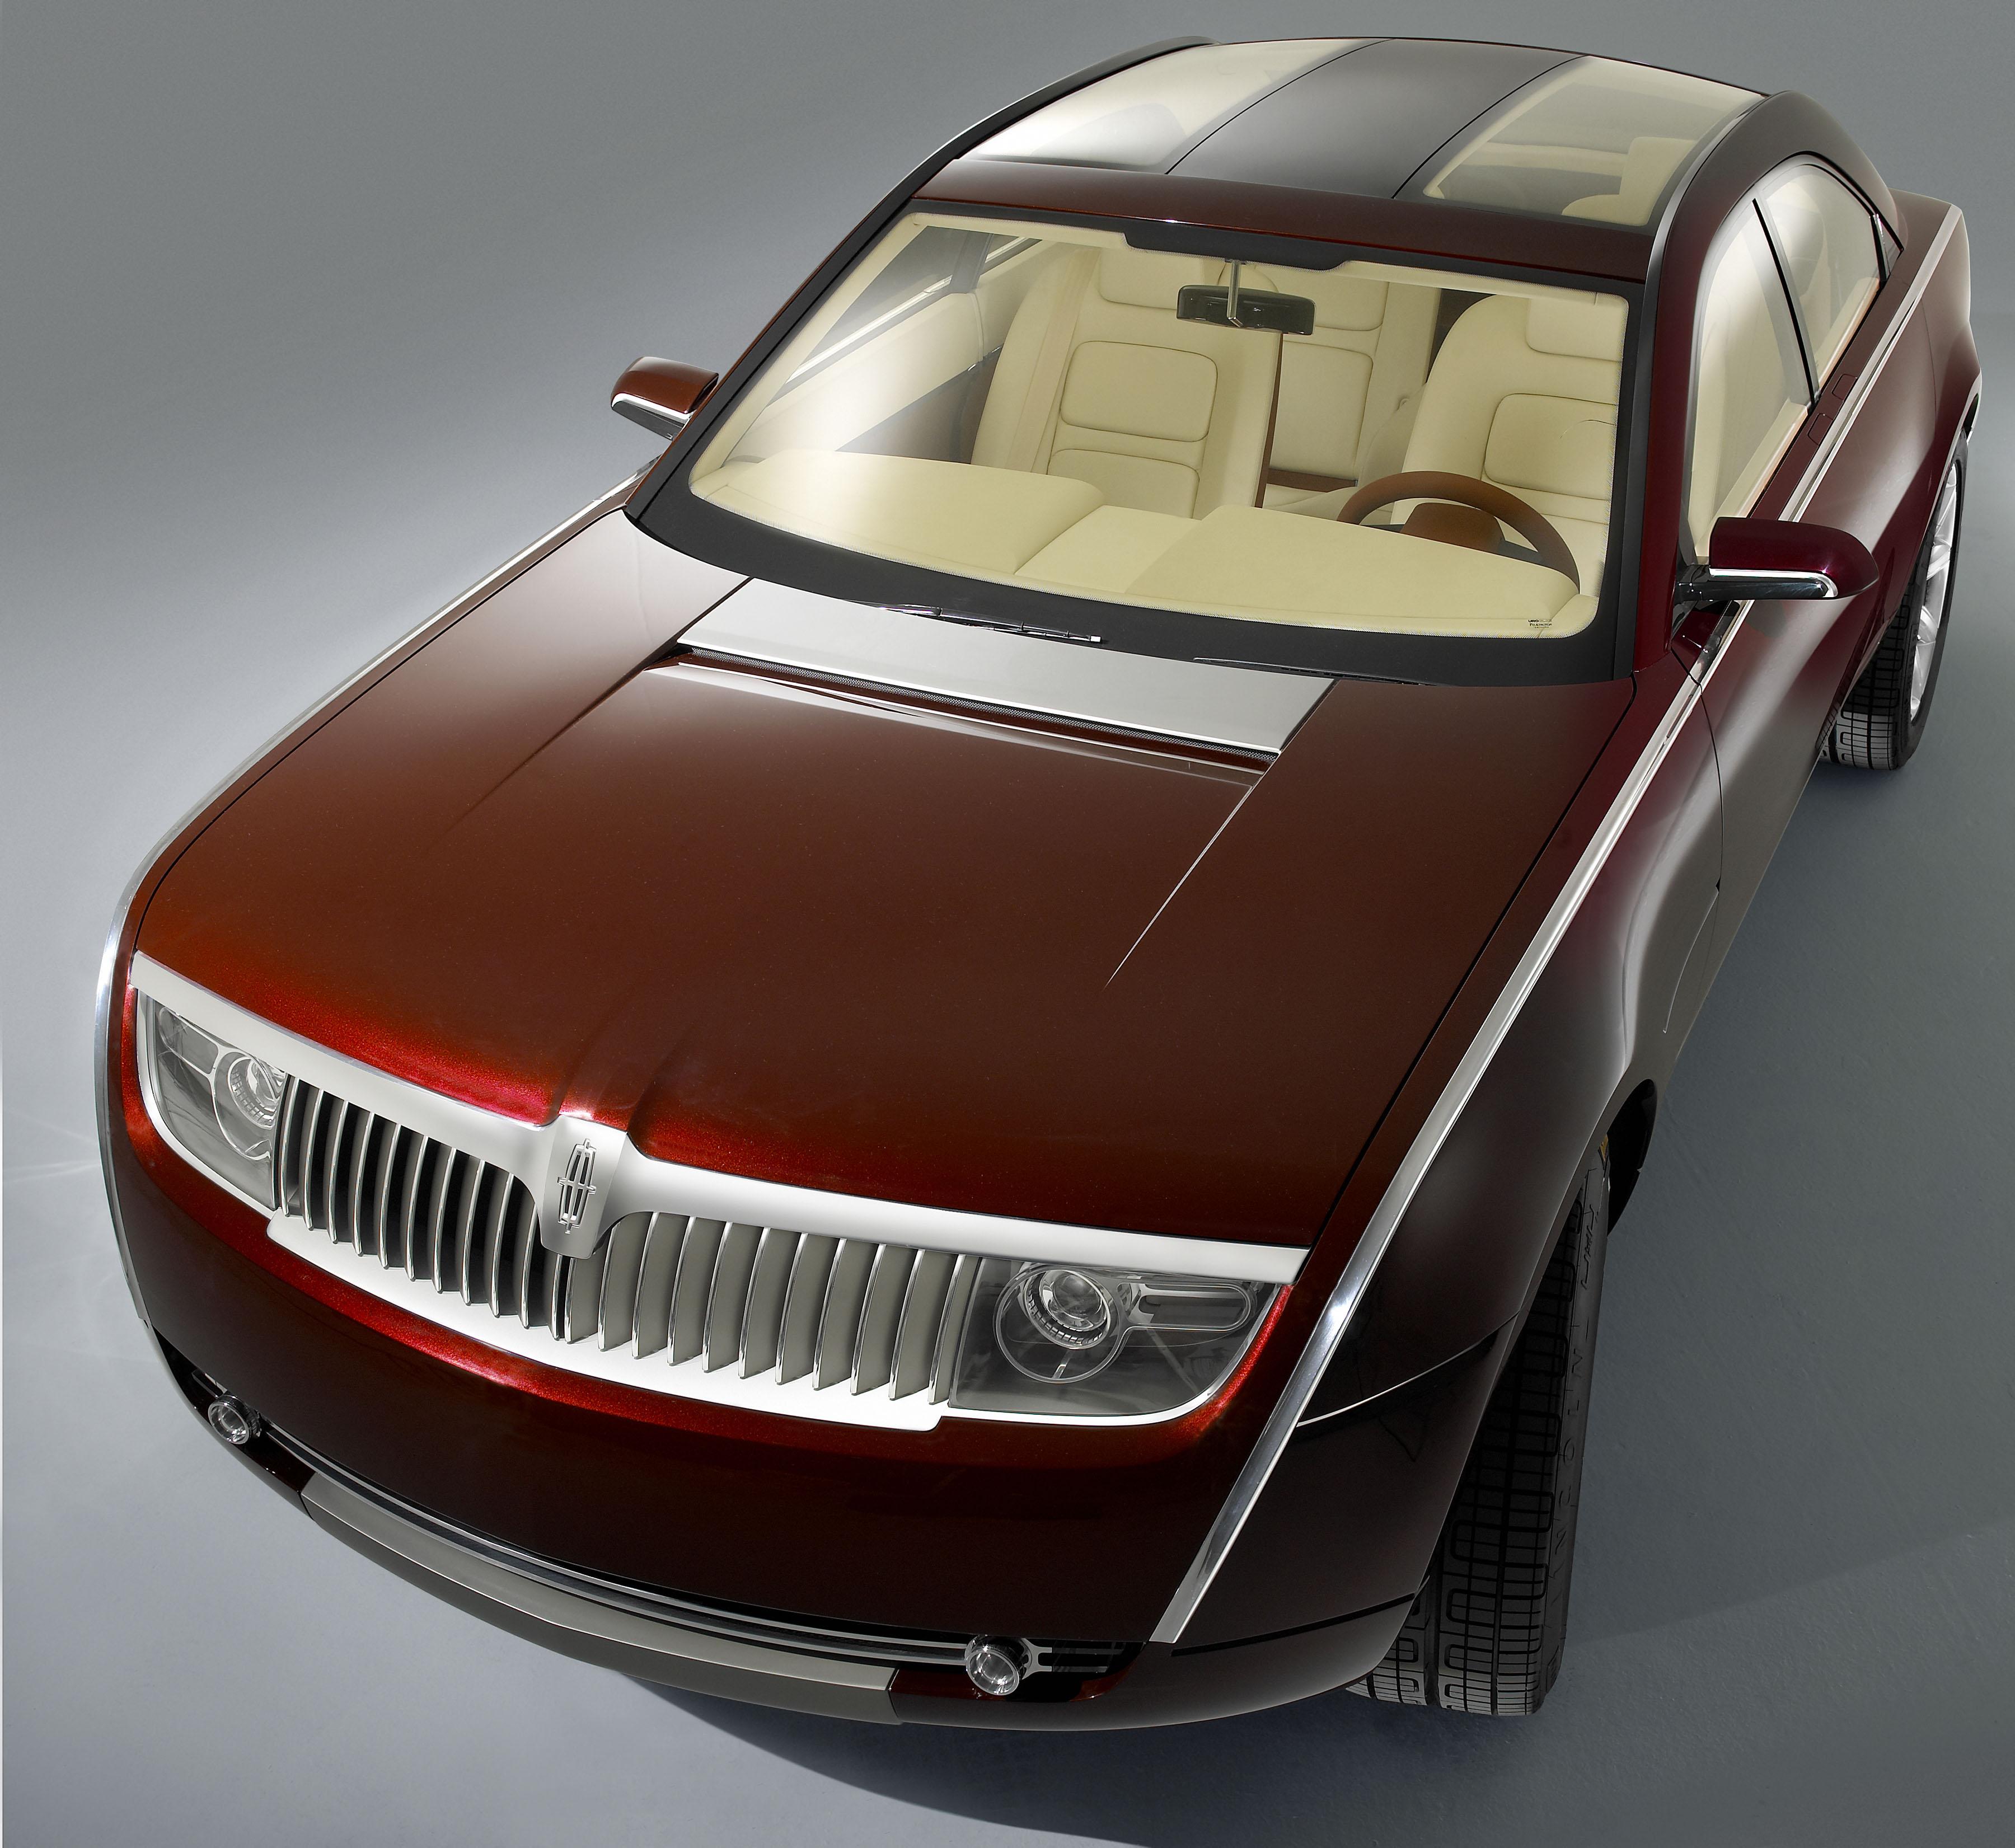 https://www.automobilesreview.com/gallery/navicross-concept/lincoln-navicross-concept-15.jpg